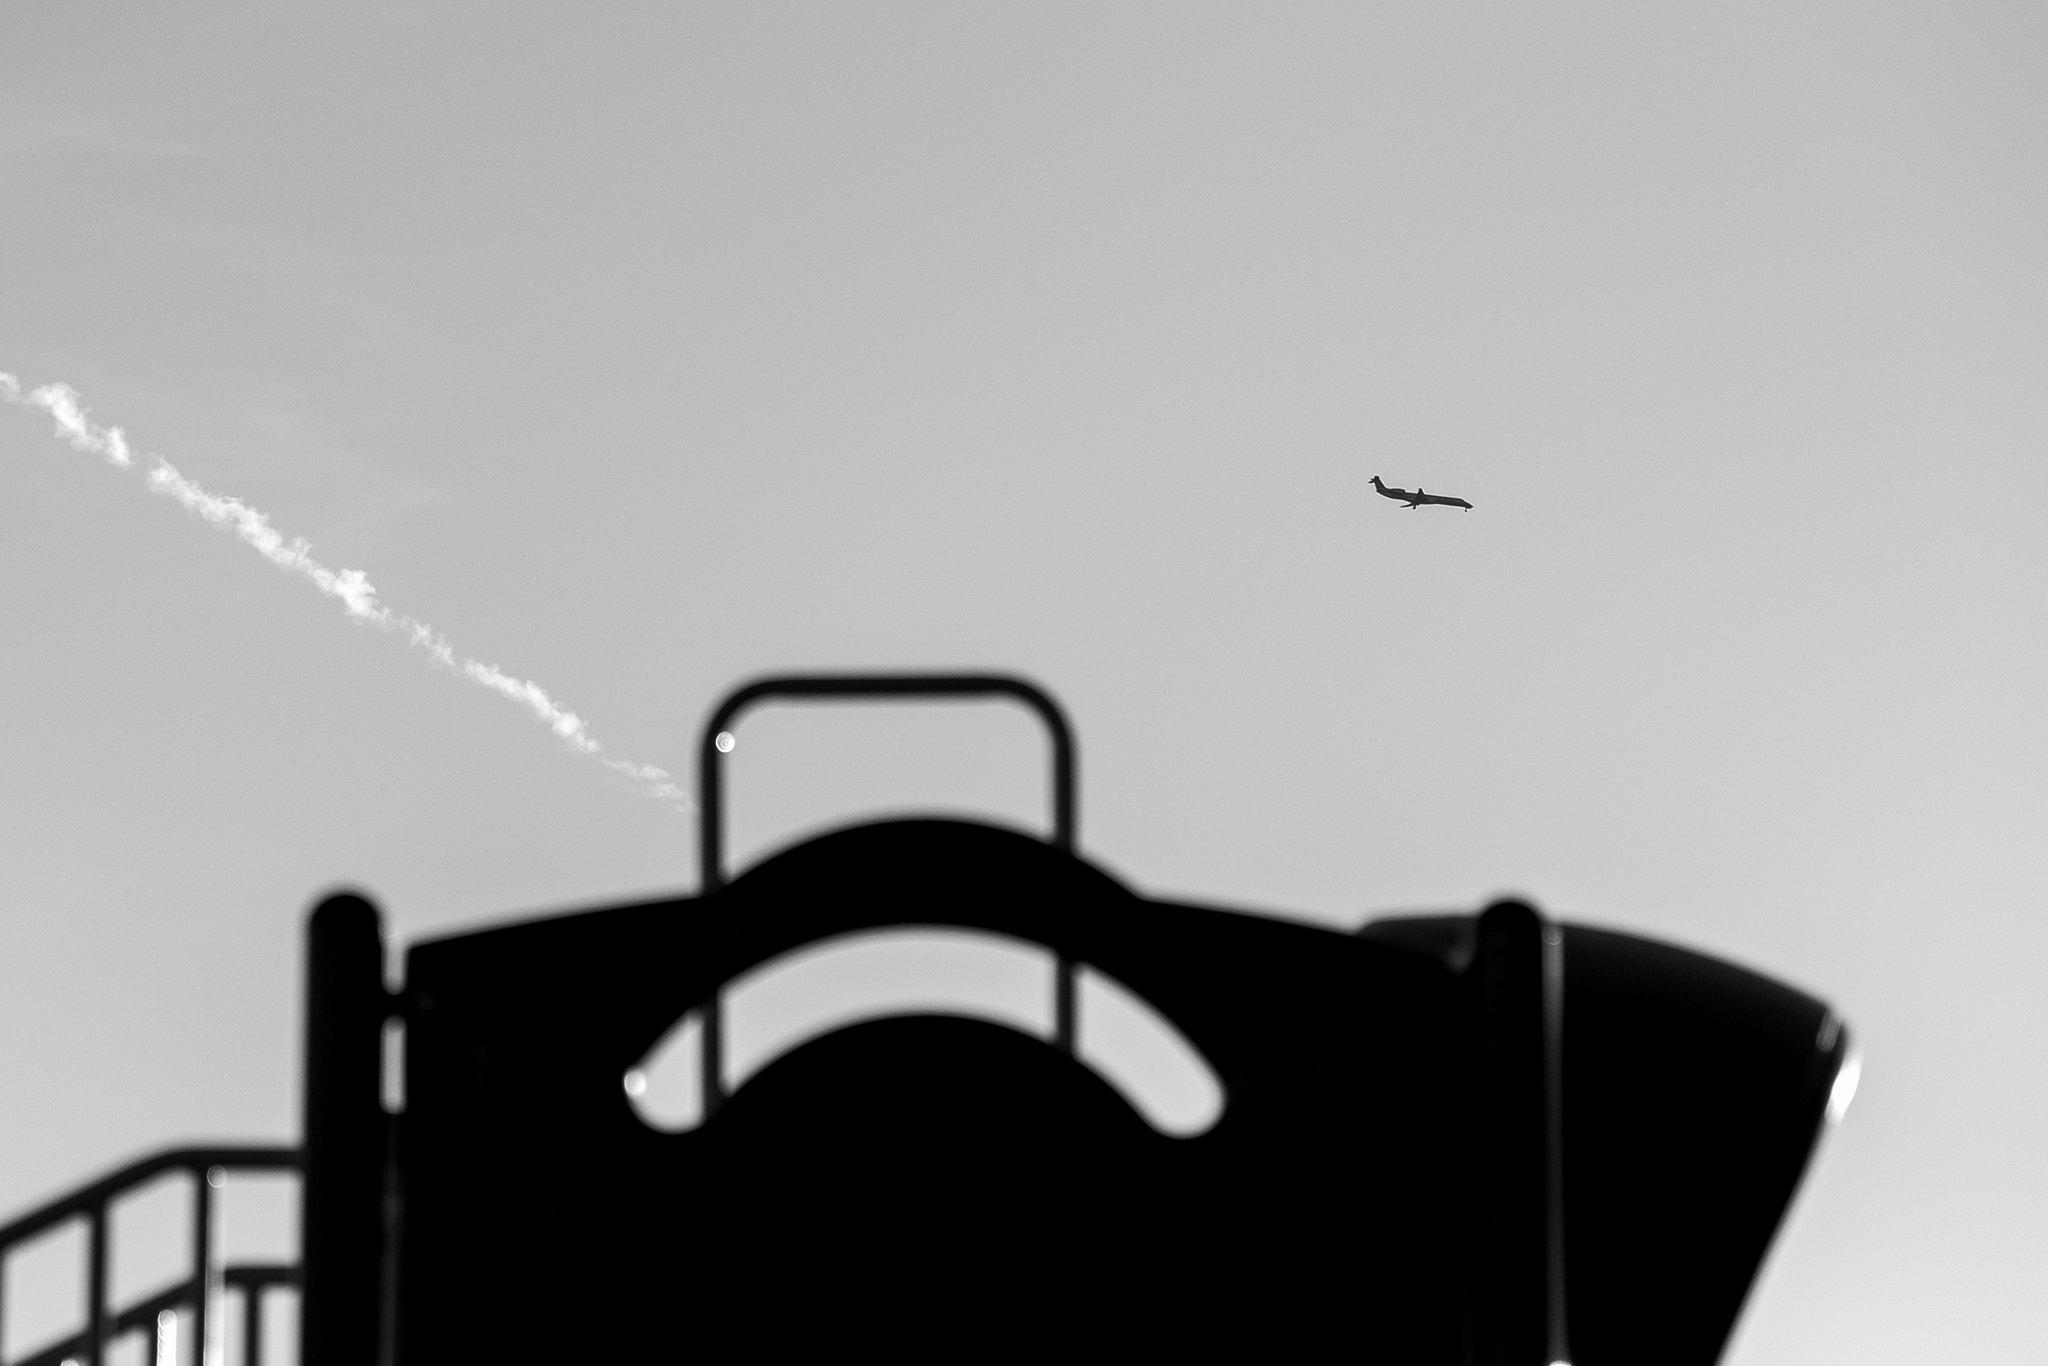 Plane over playground